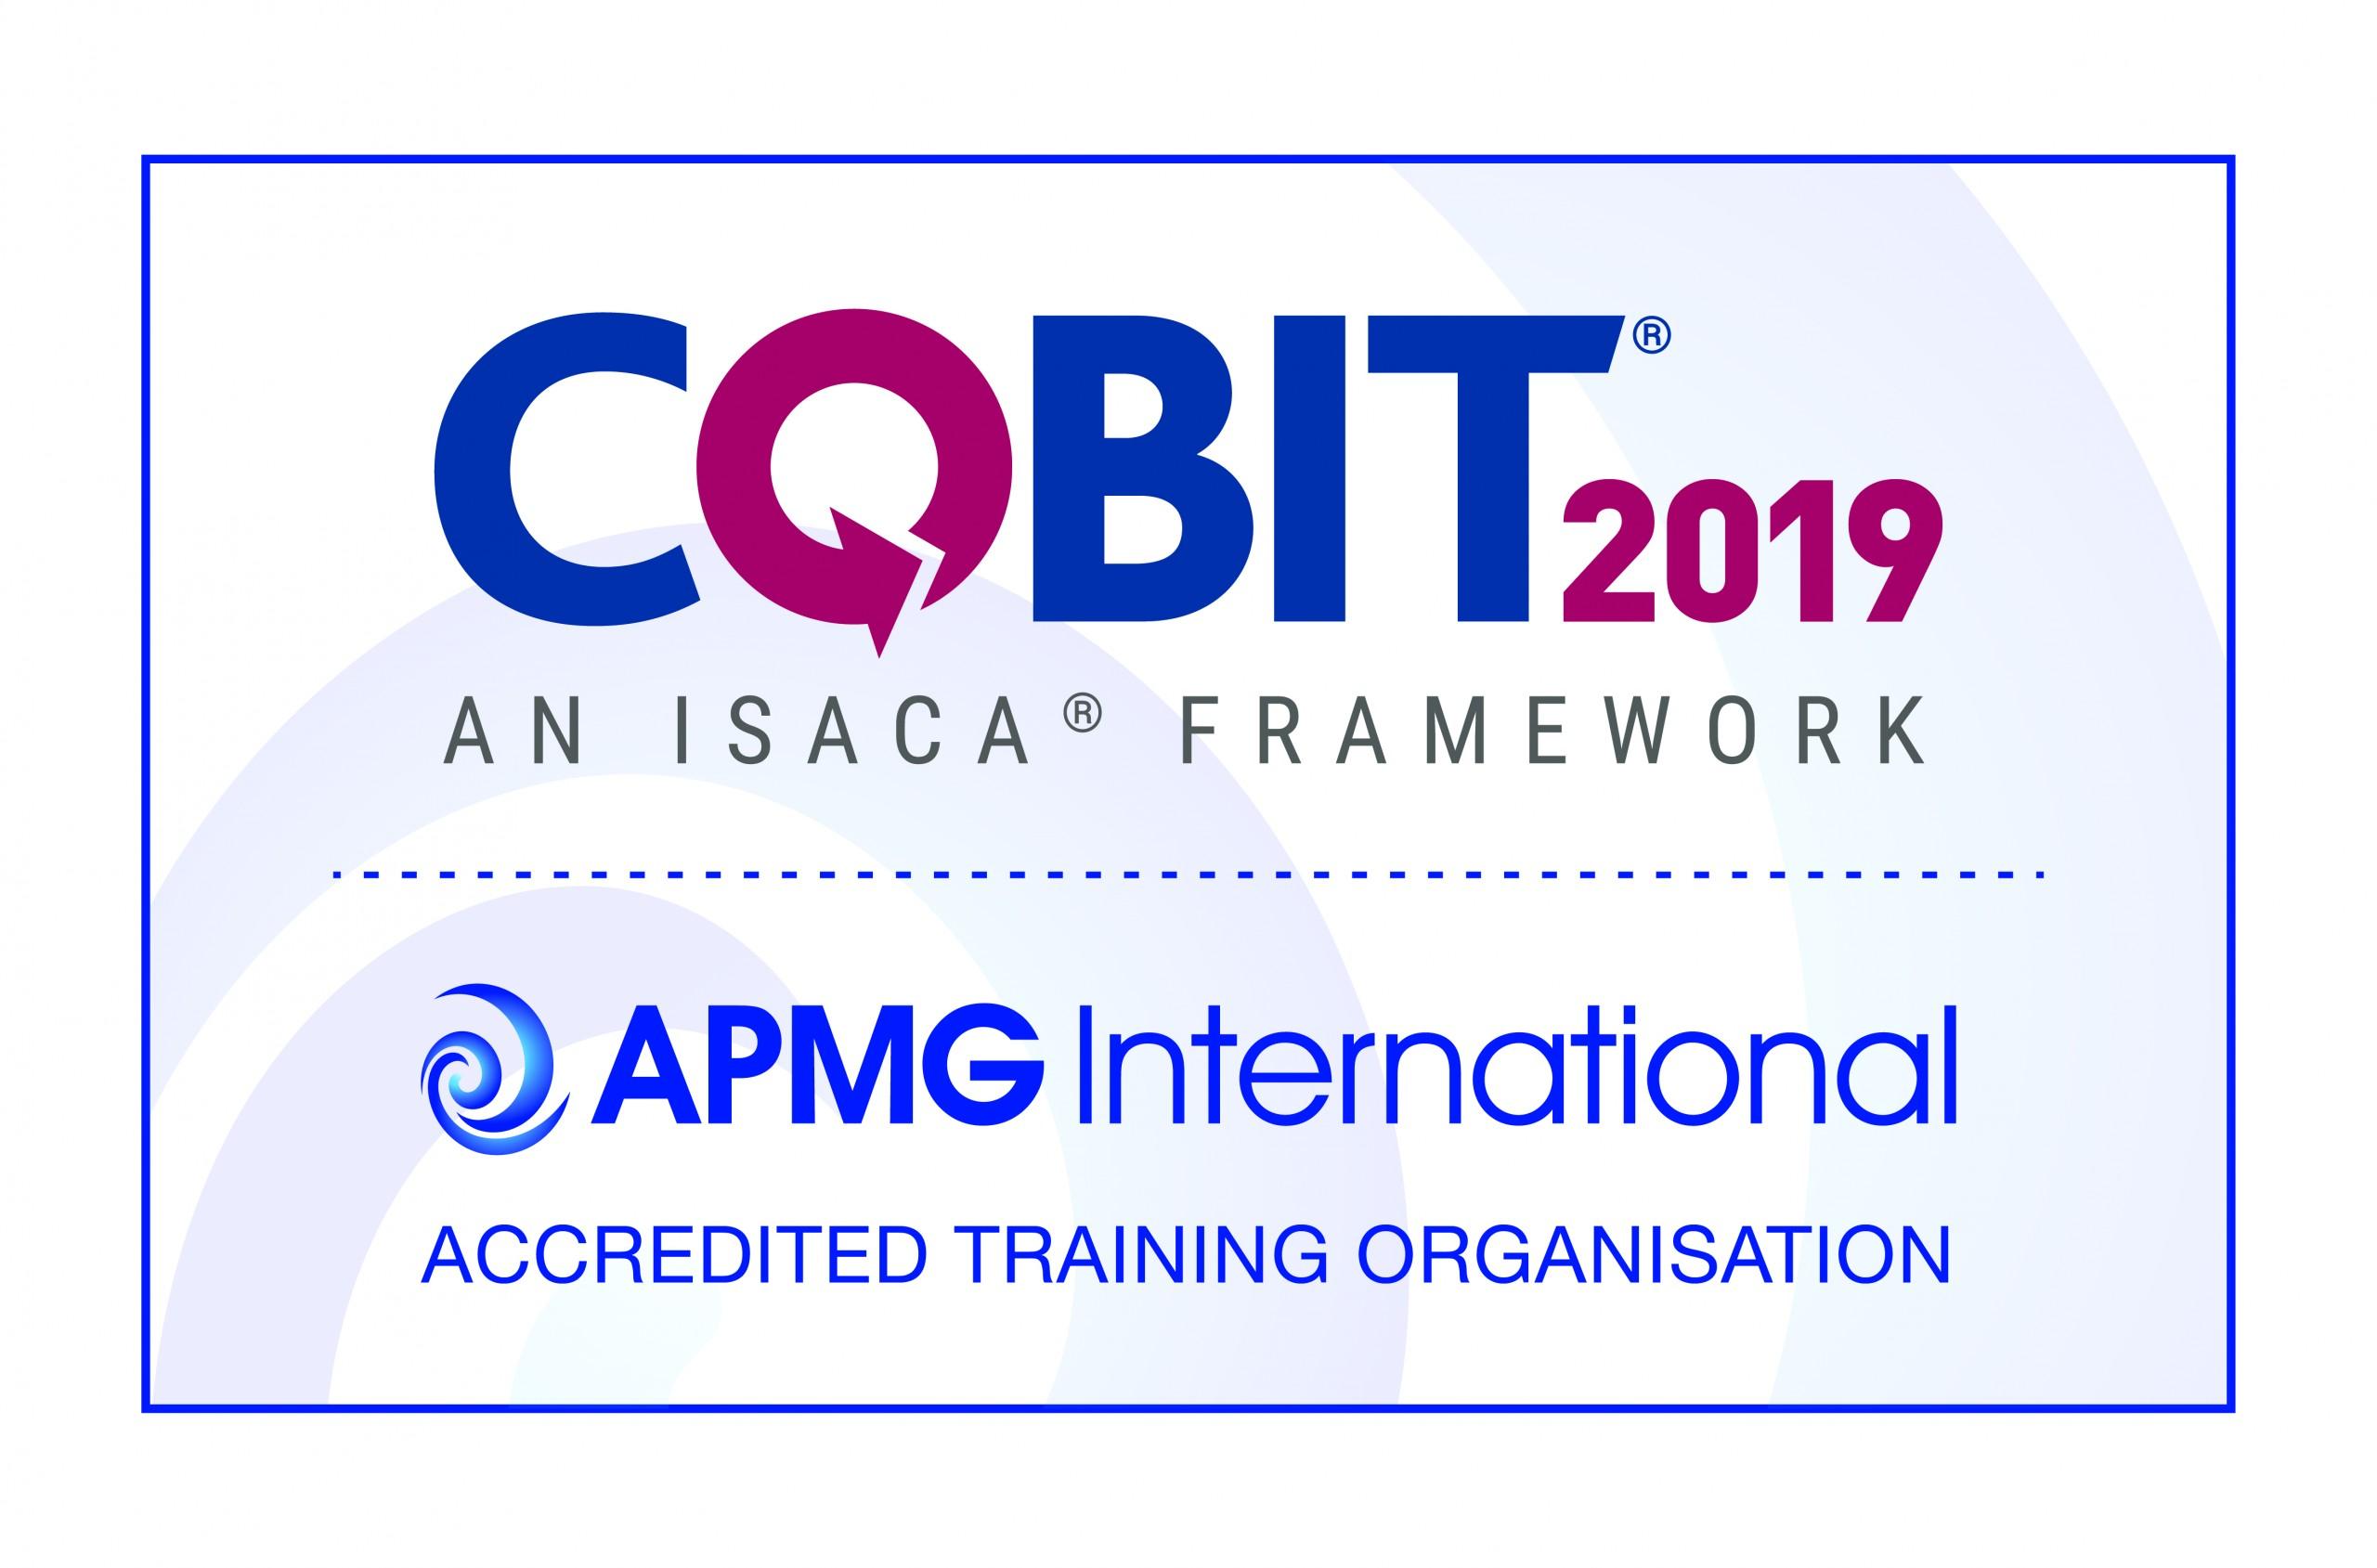 Corso COBIT 2019 Foundation